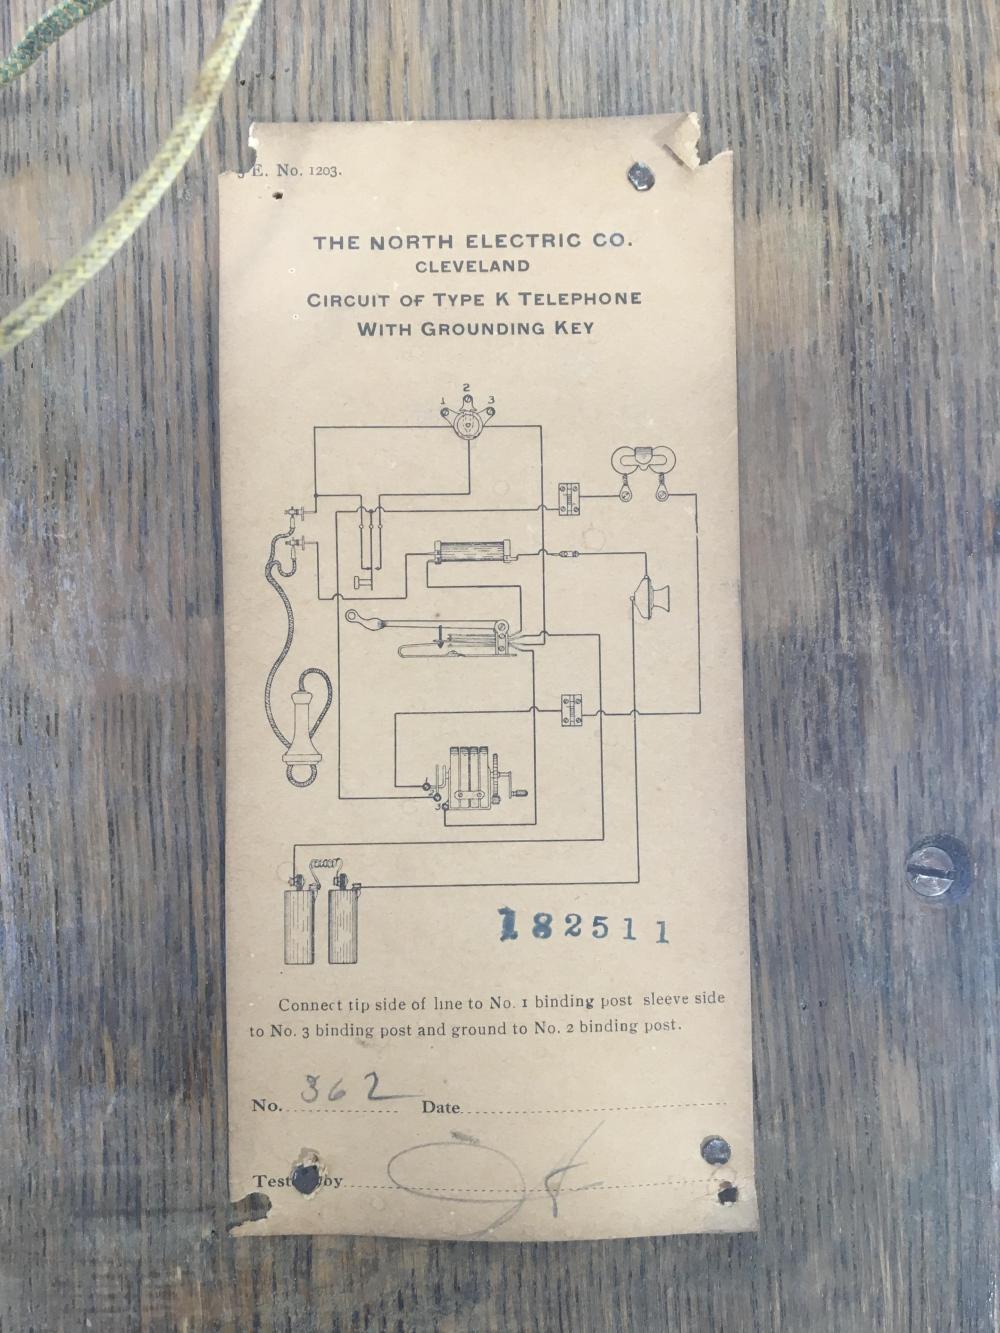 Antique Crank Phone Wiring Diagrams - Trusted Wiring Diagram Online - Old Telephone Wiring Diagram